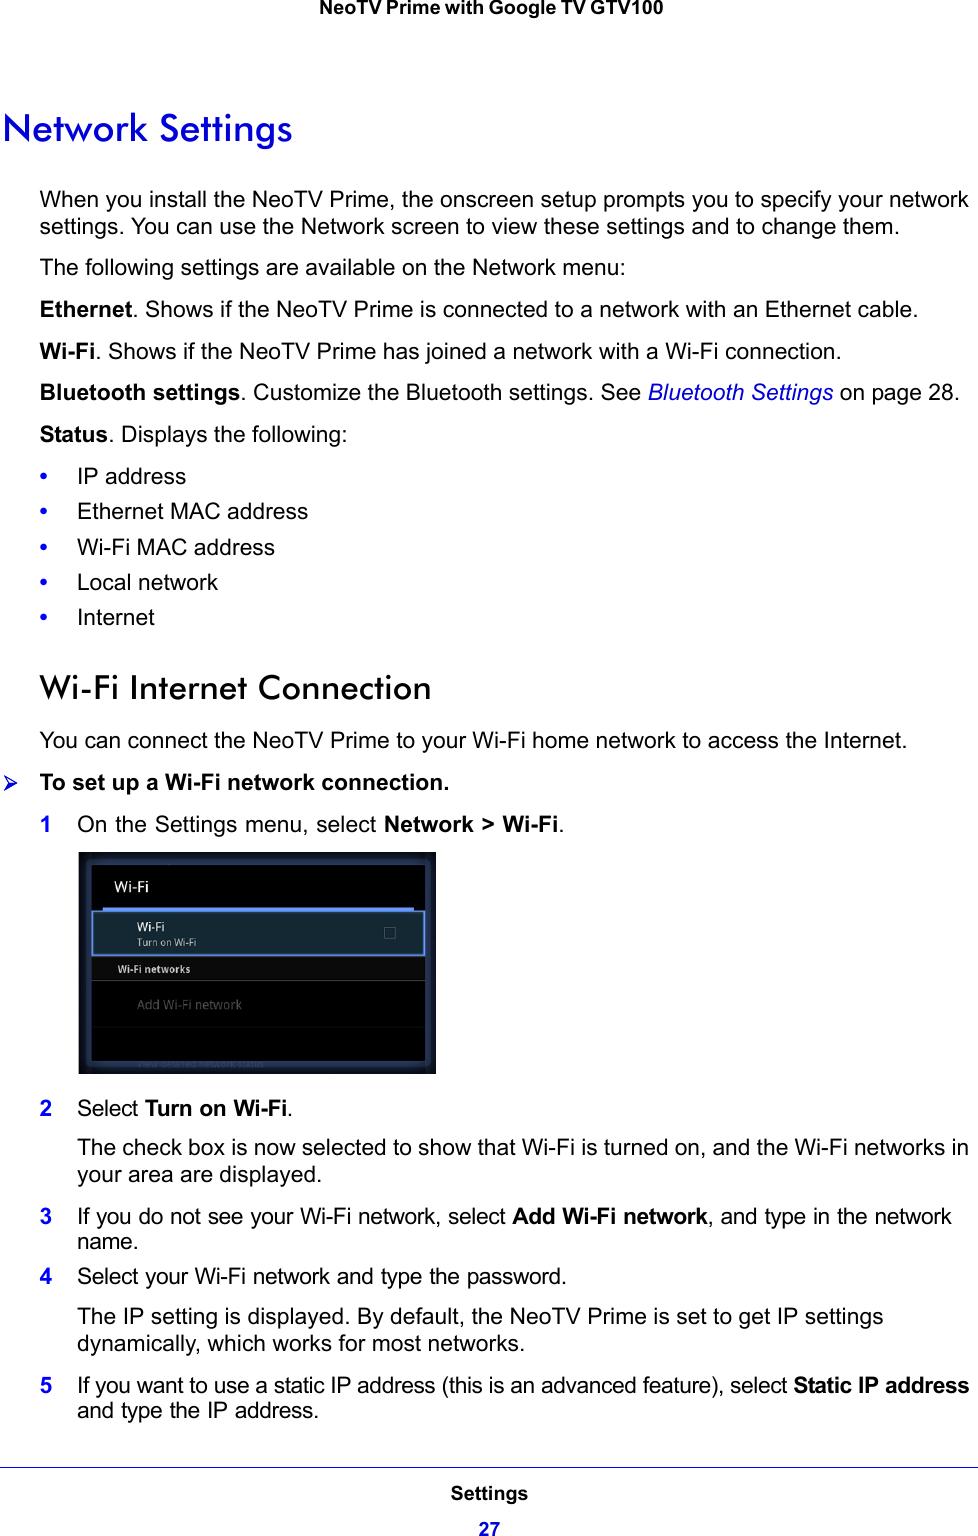 Netgear Gtv100 User Guide NeoTV Prime With Google TV Manual